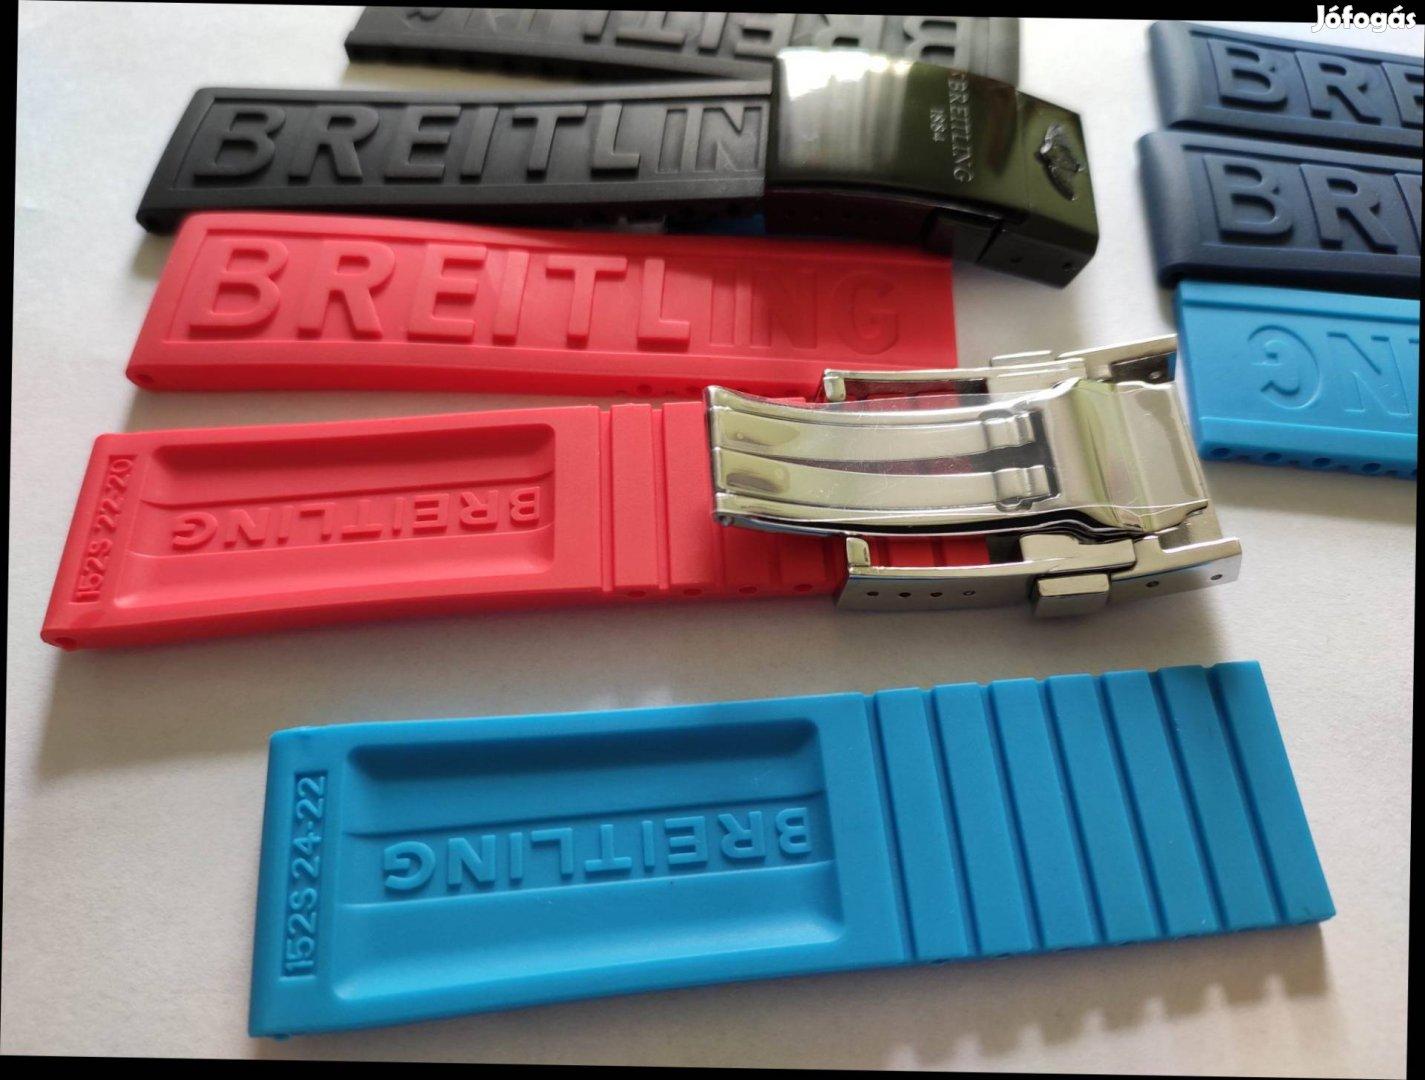 Breitling 22 24mm gumiszíj szíj óraszíj több szín